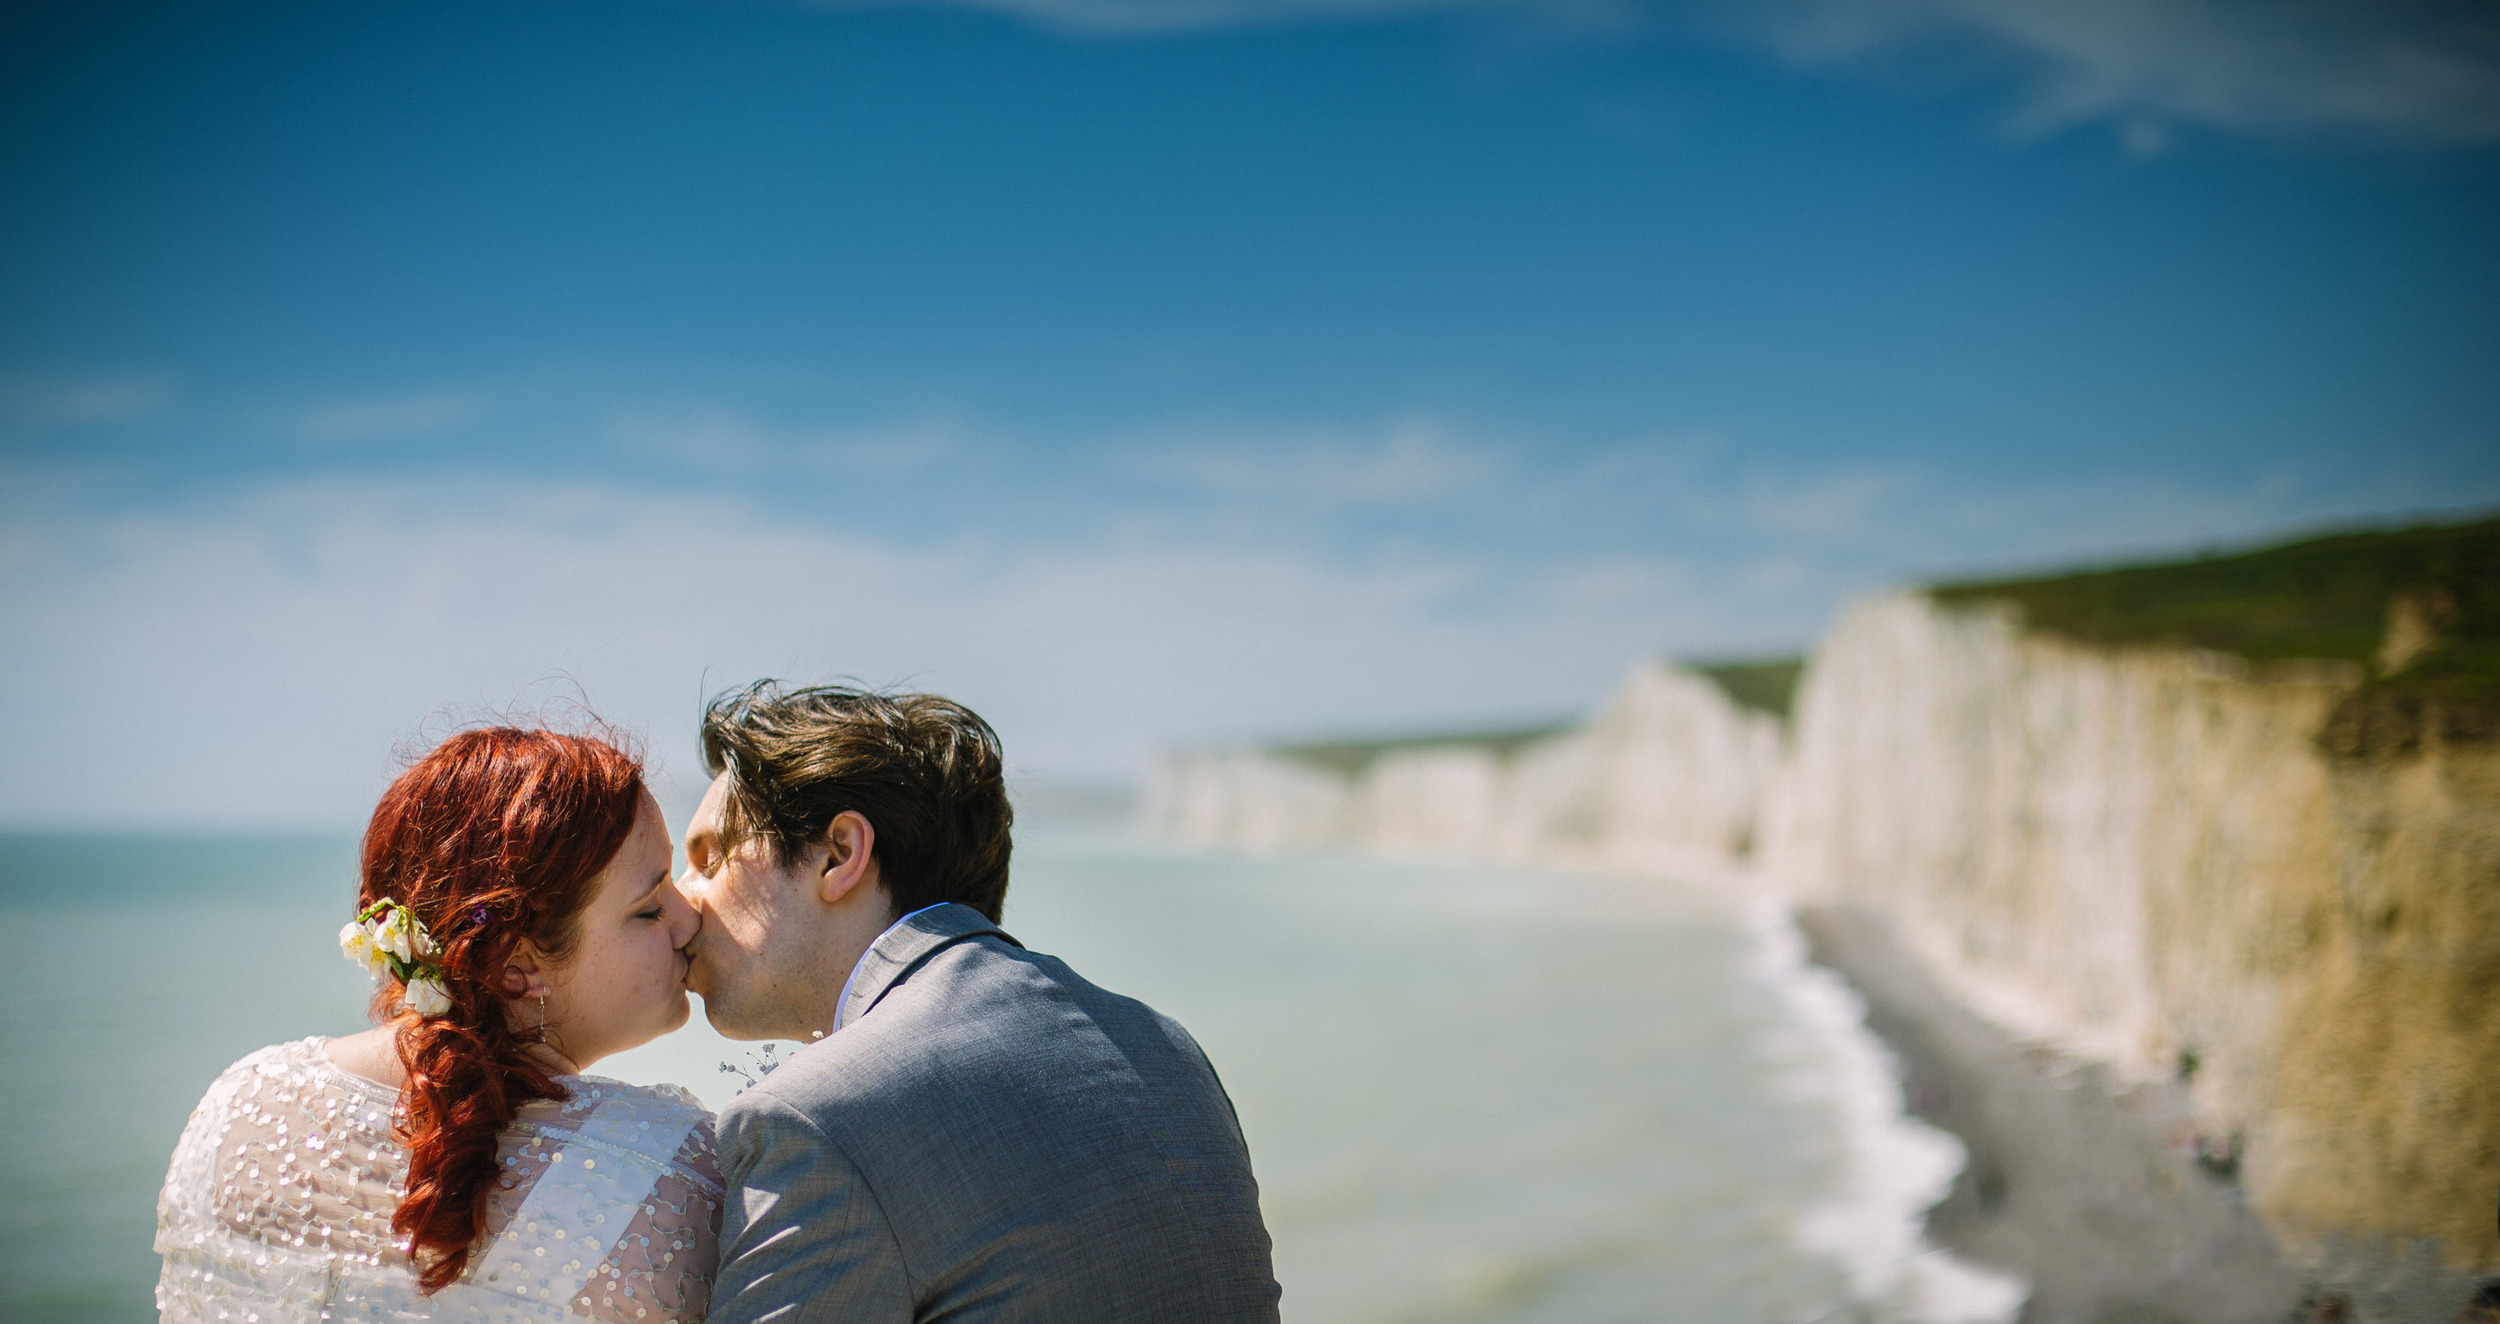 eastbourne-cliffs-romance-2-london-uk-destination-wedding-photography-Adam-Rowley